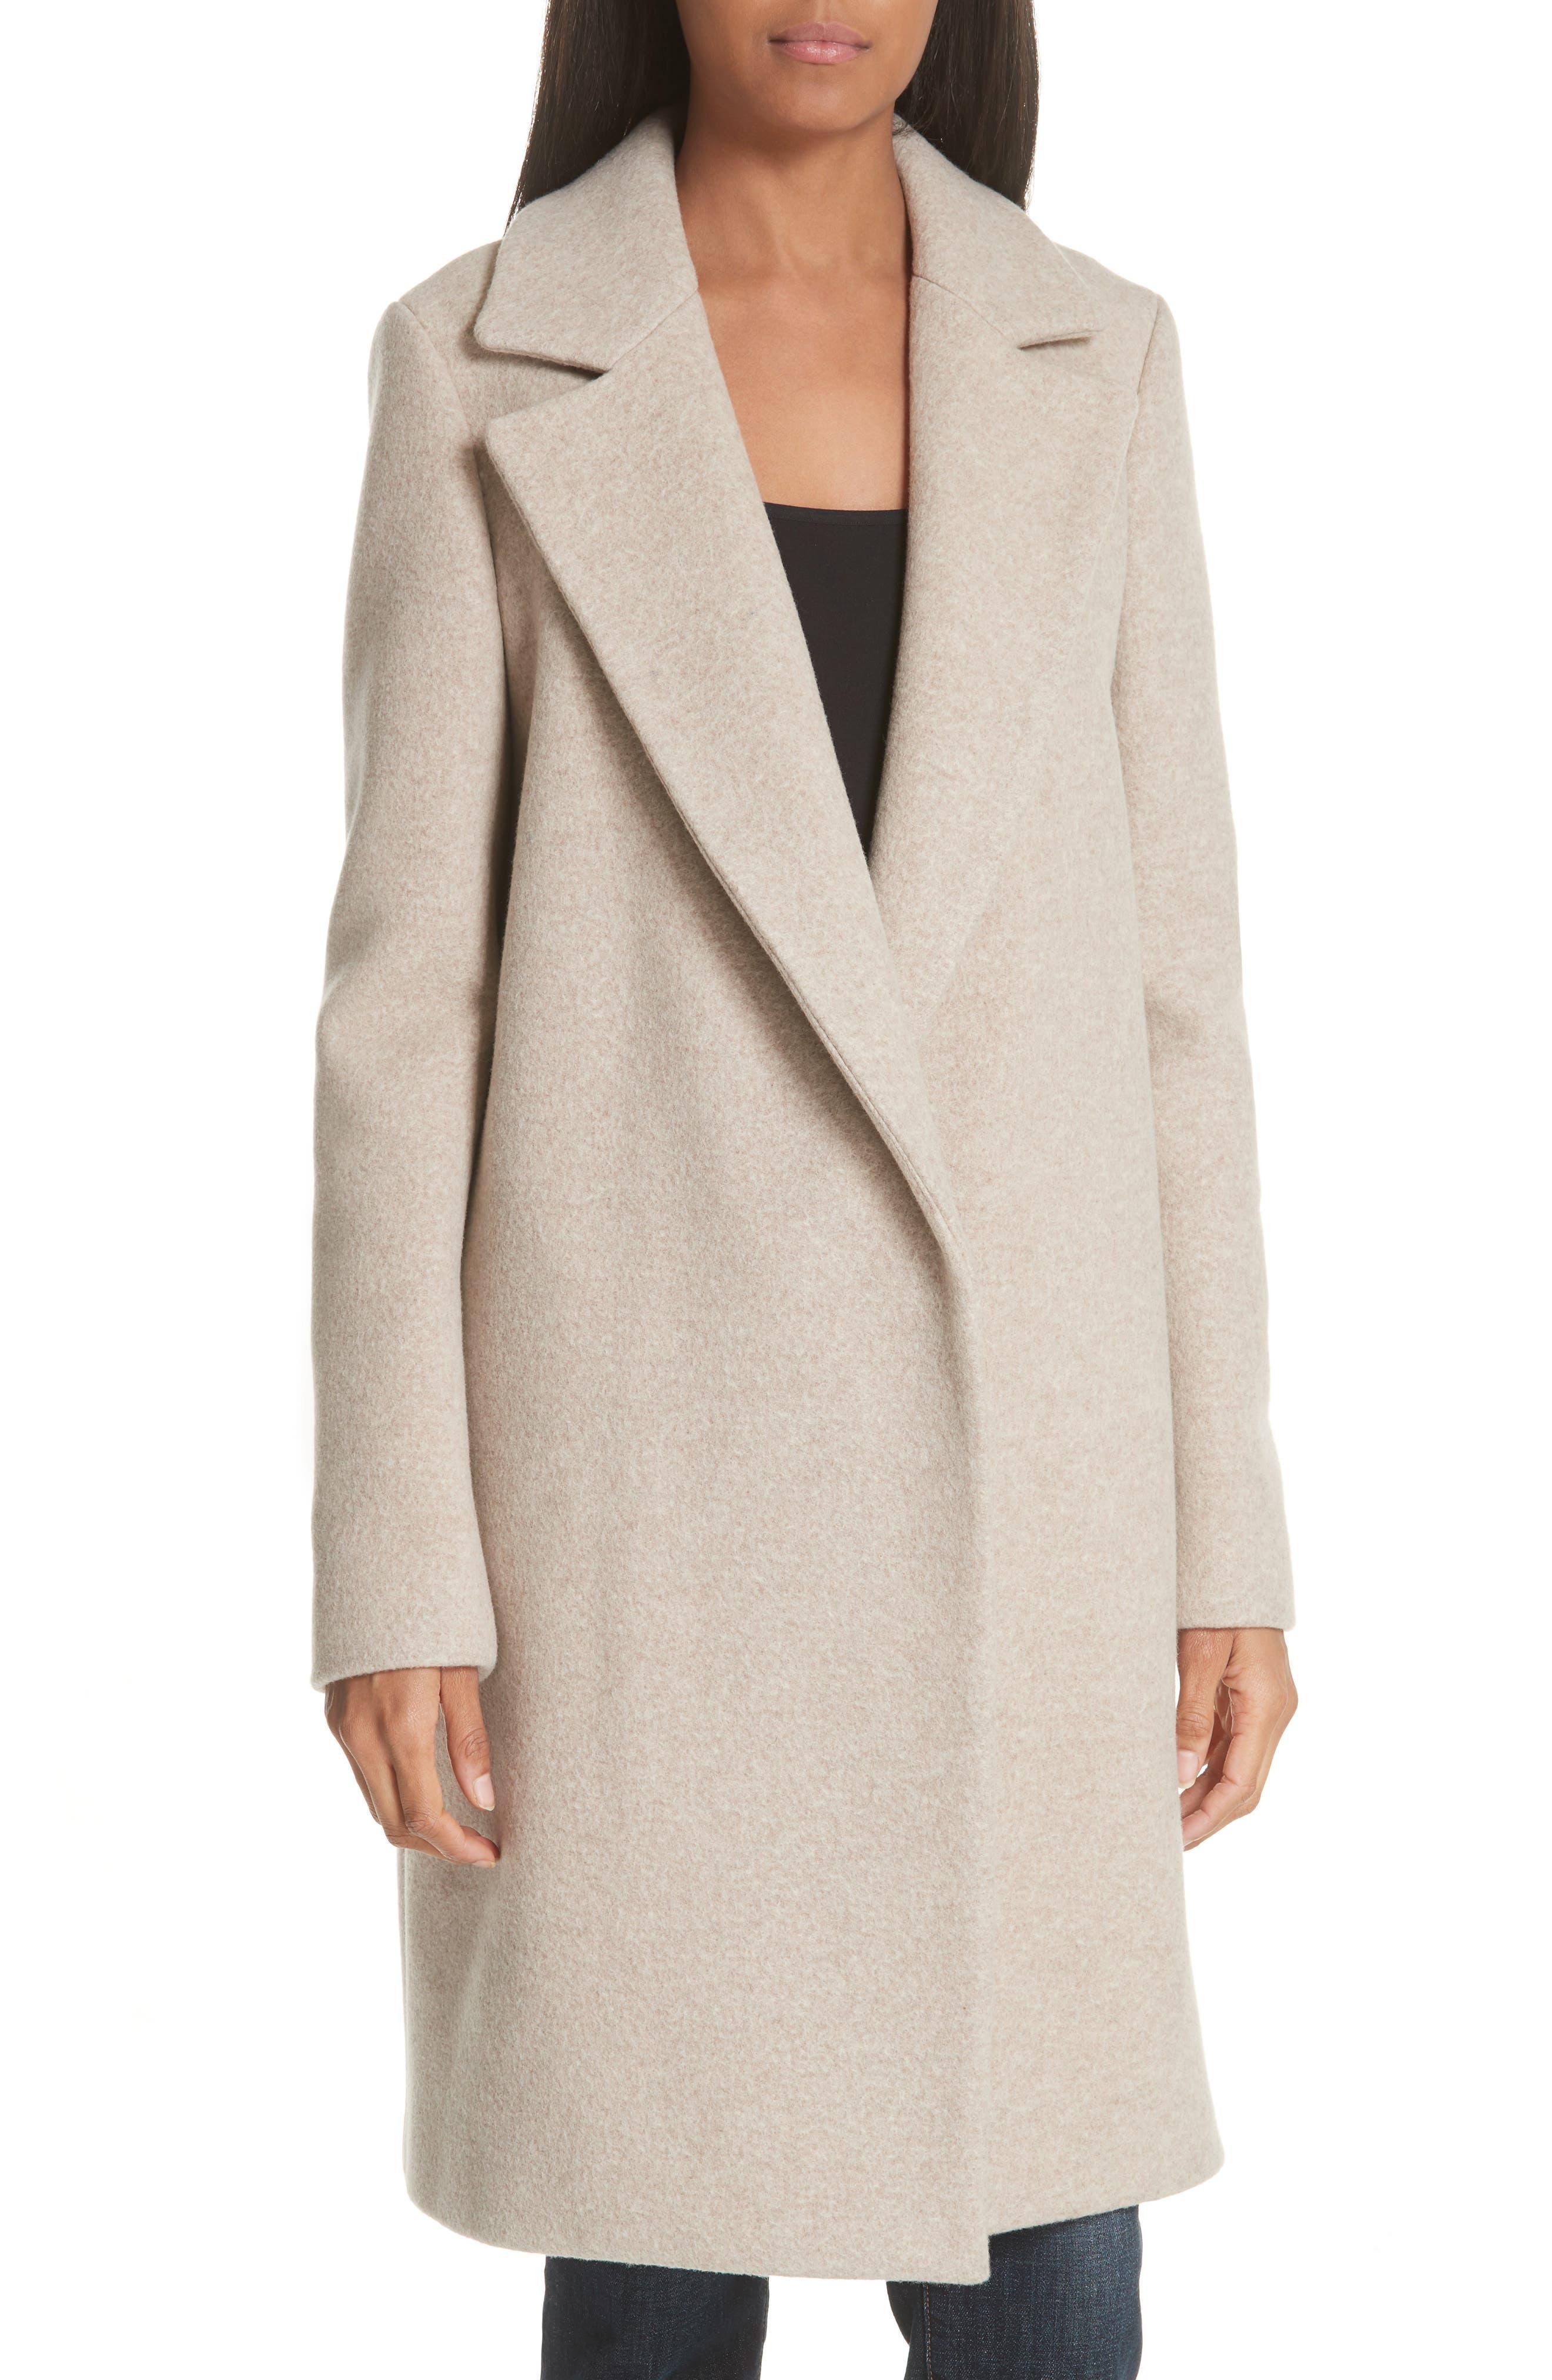 Clairene Hawthorne Wool Cashmere Coat,                             Main thumbnail 1, color,                             260